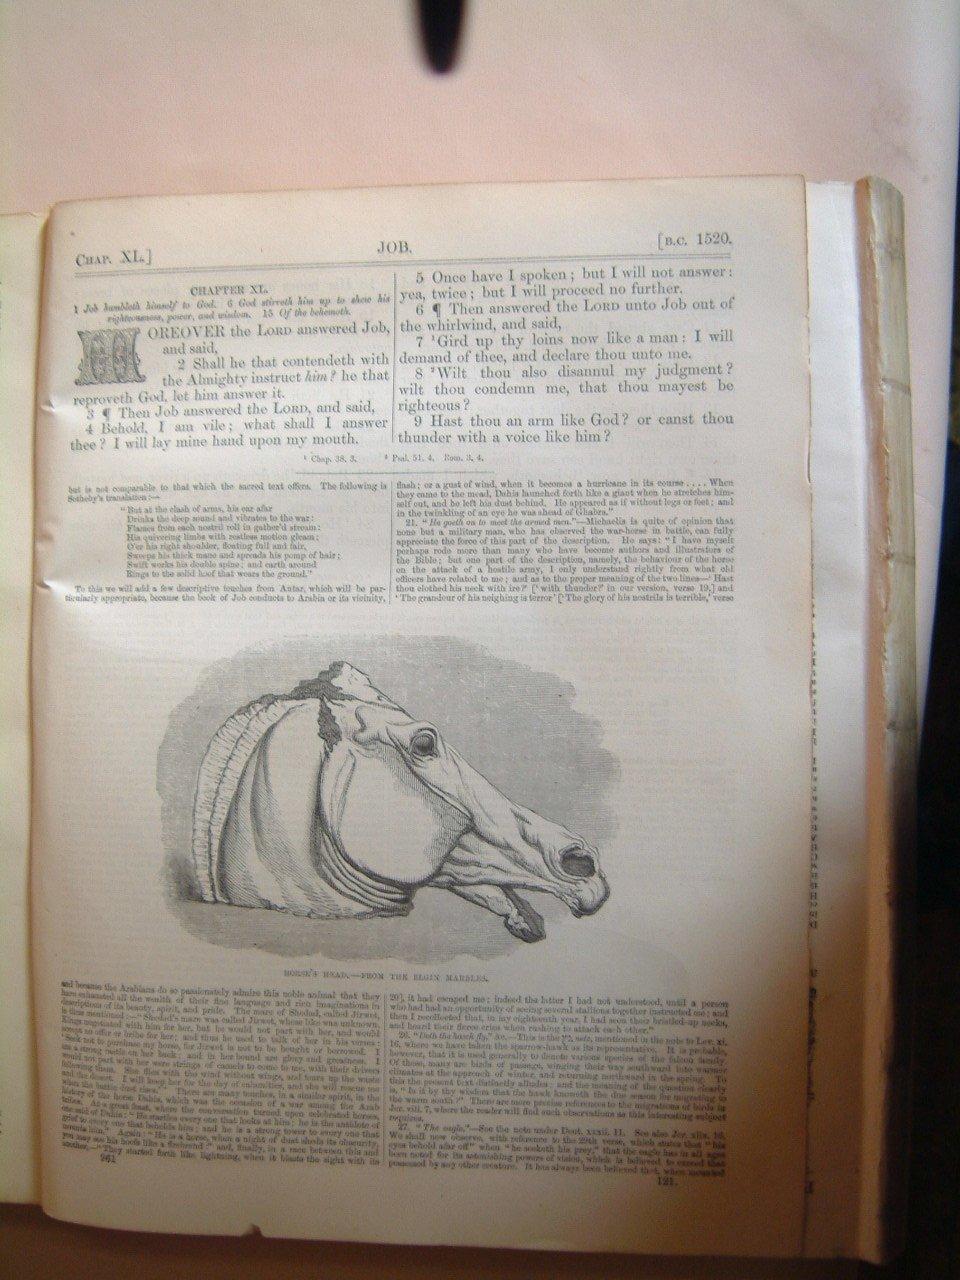 horses_head_page2